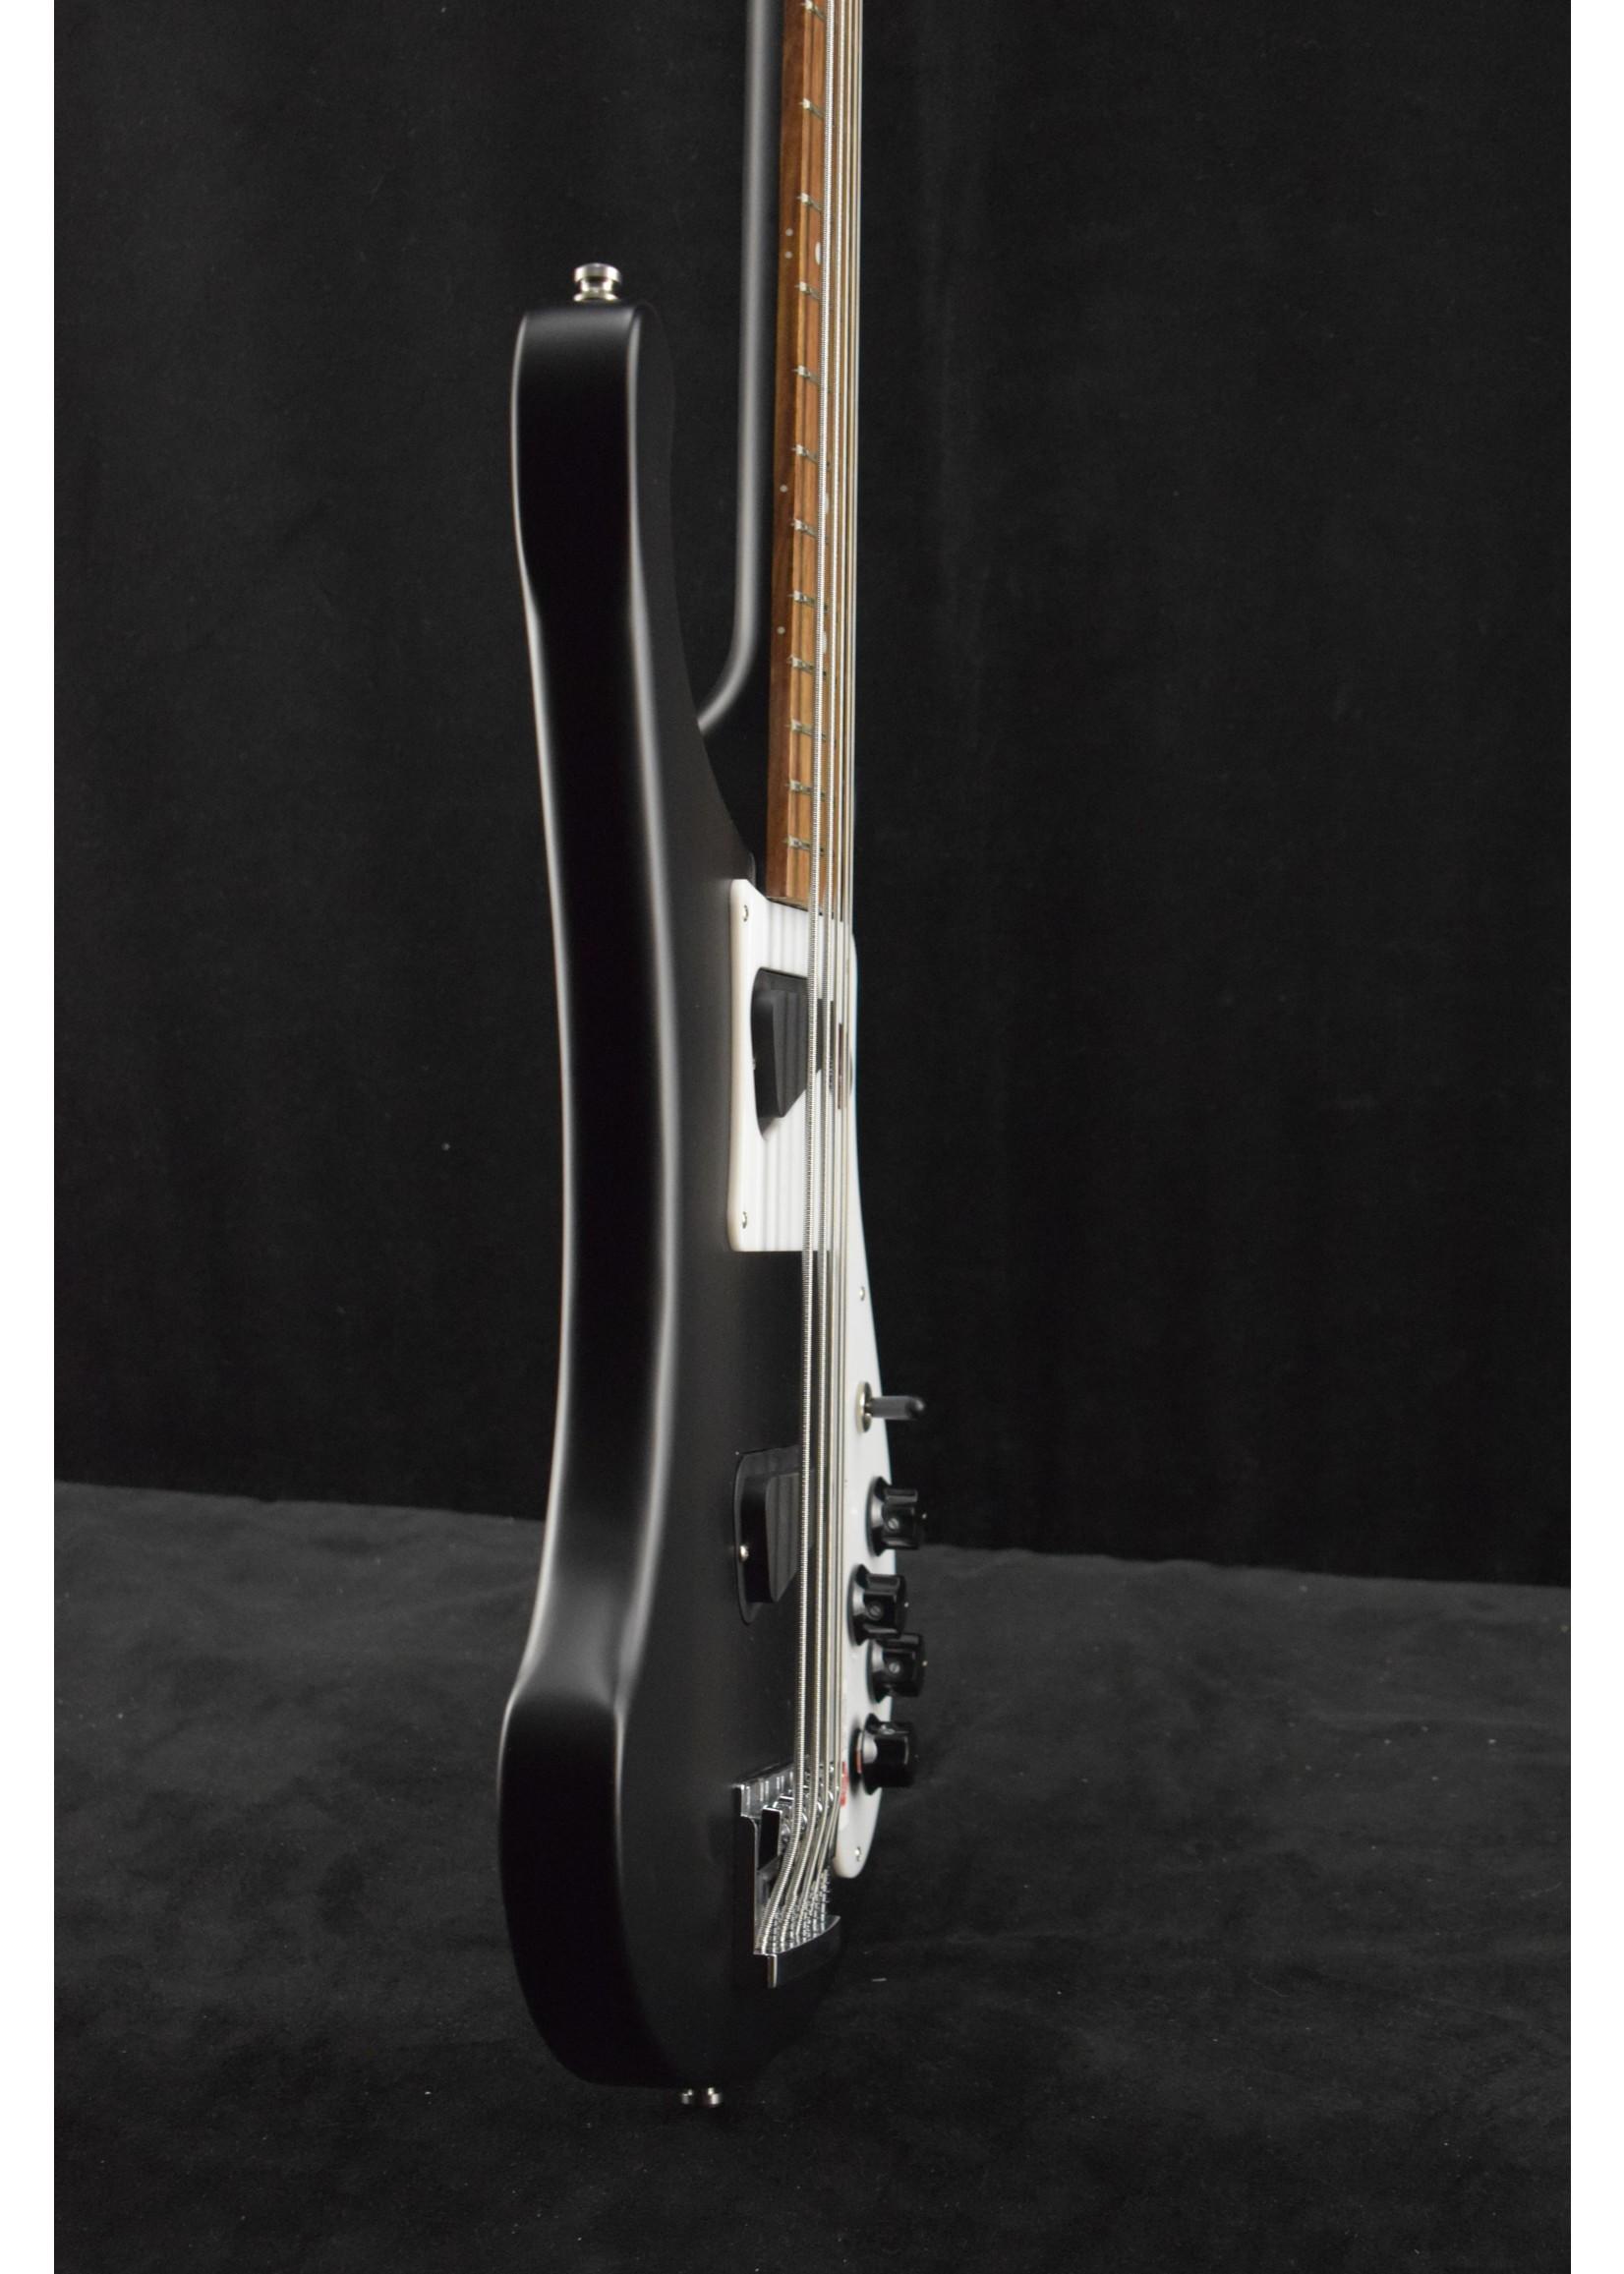 Rickenbacker Rickenbacker 4003S/5 5-String Bass Matte Black